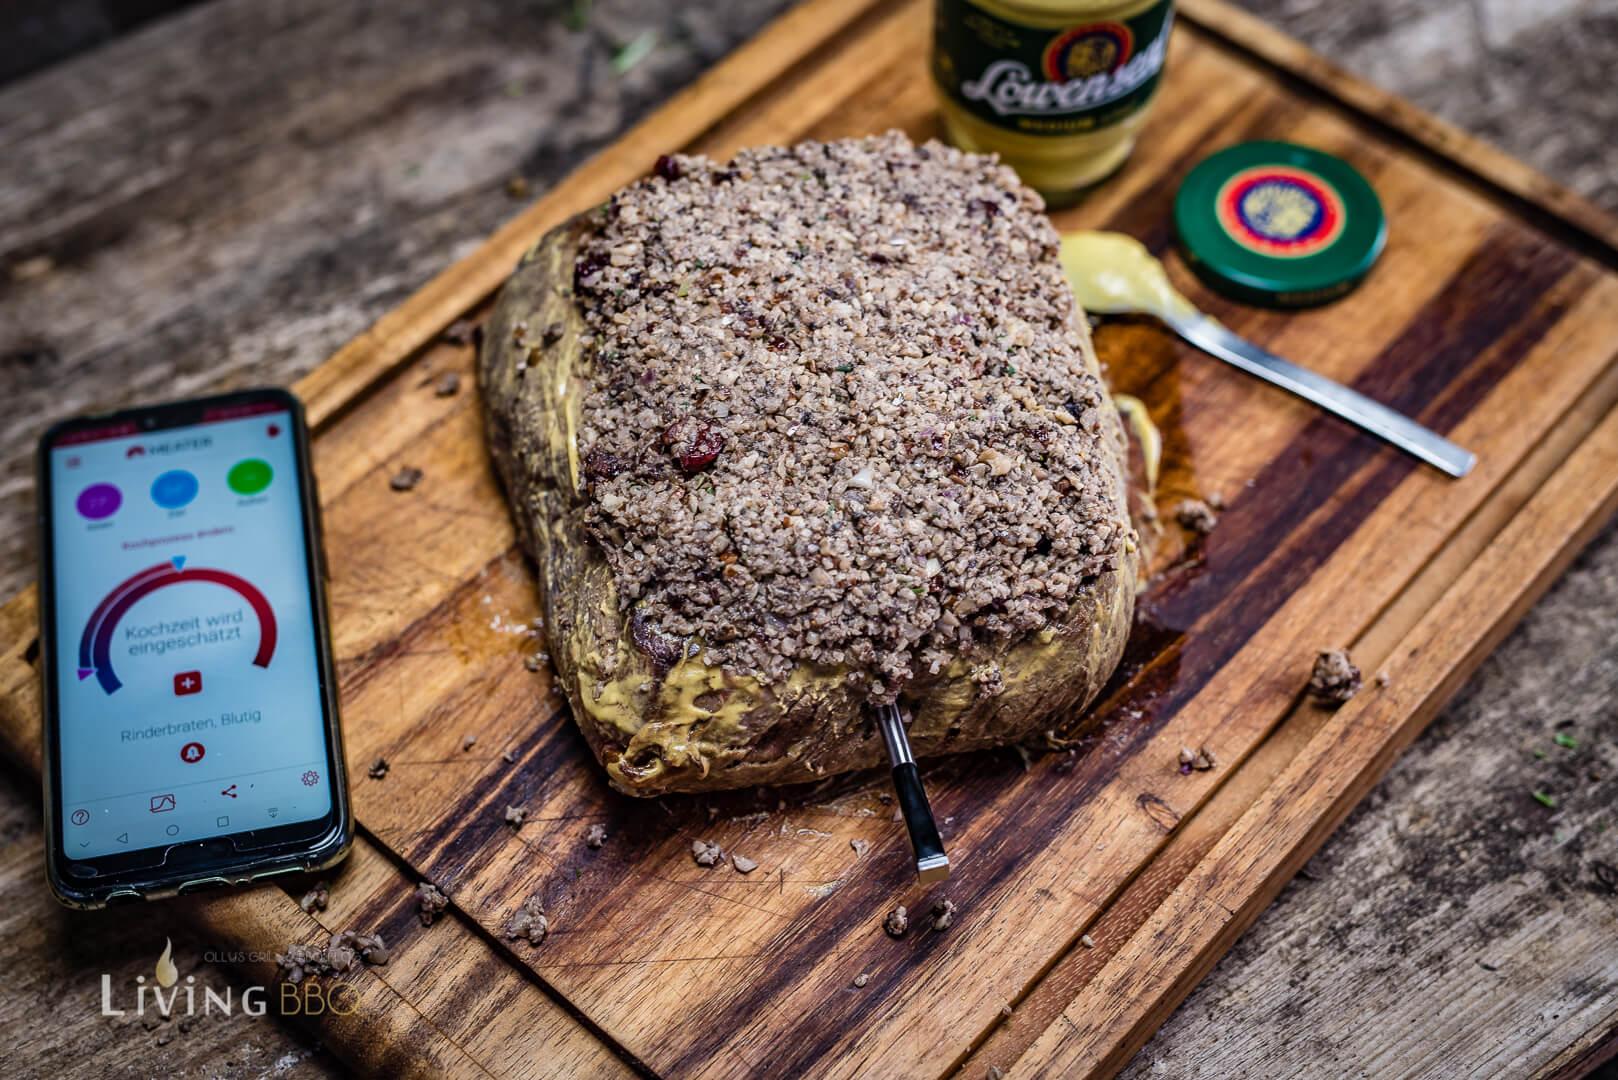 Roastbeef mit Grillthermometer